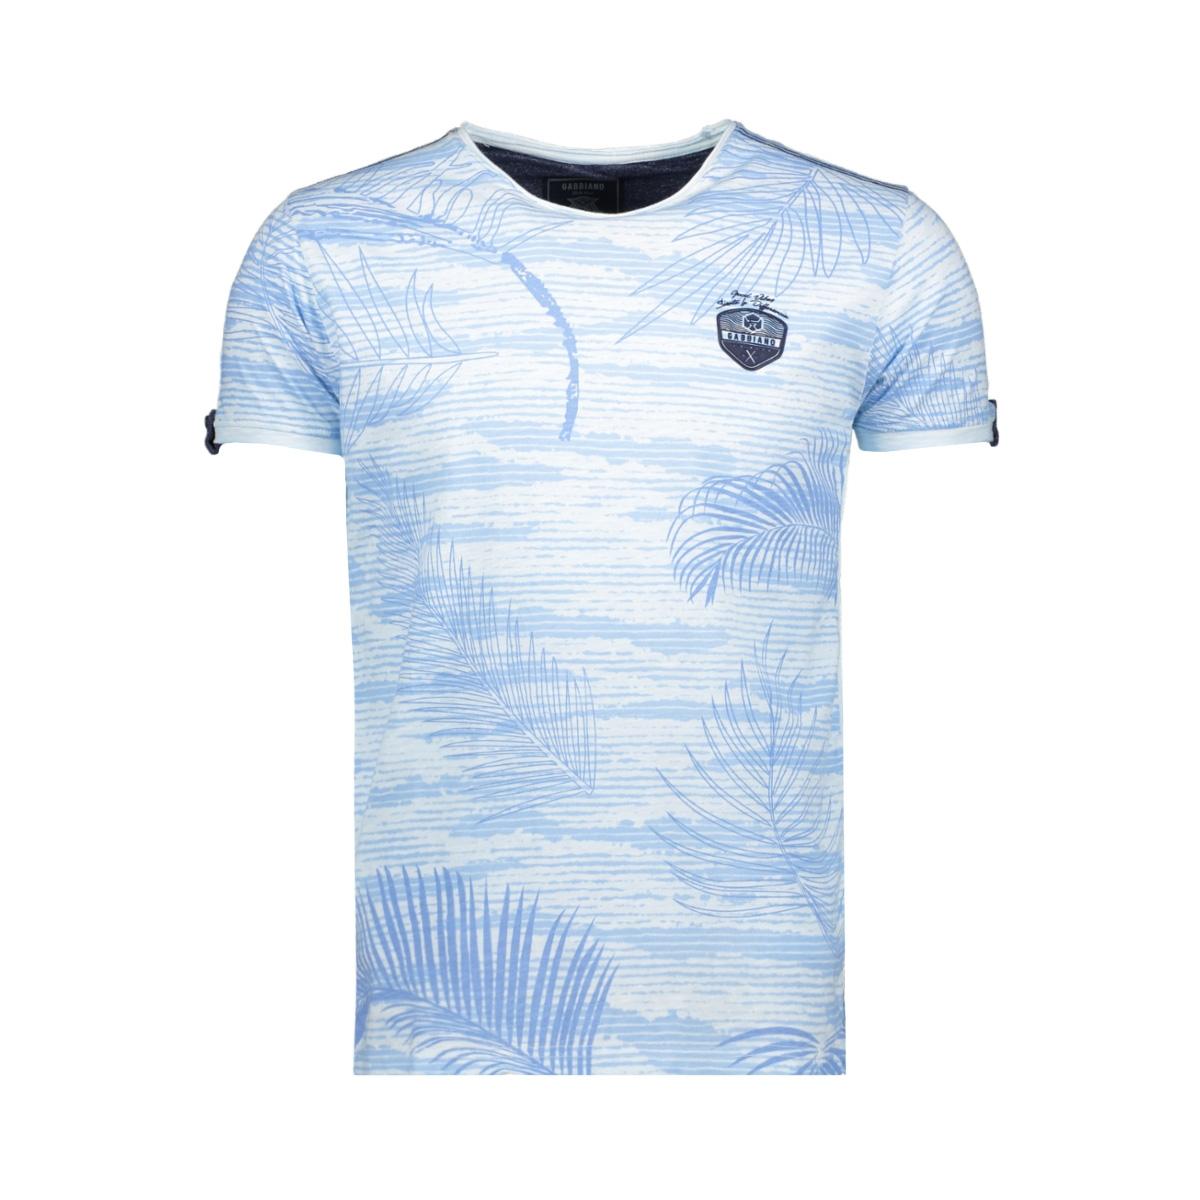 t shirt 15125 gabbiano t-shirt blue